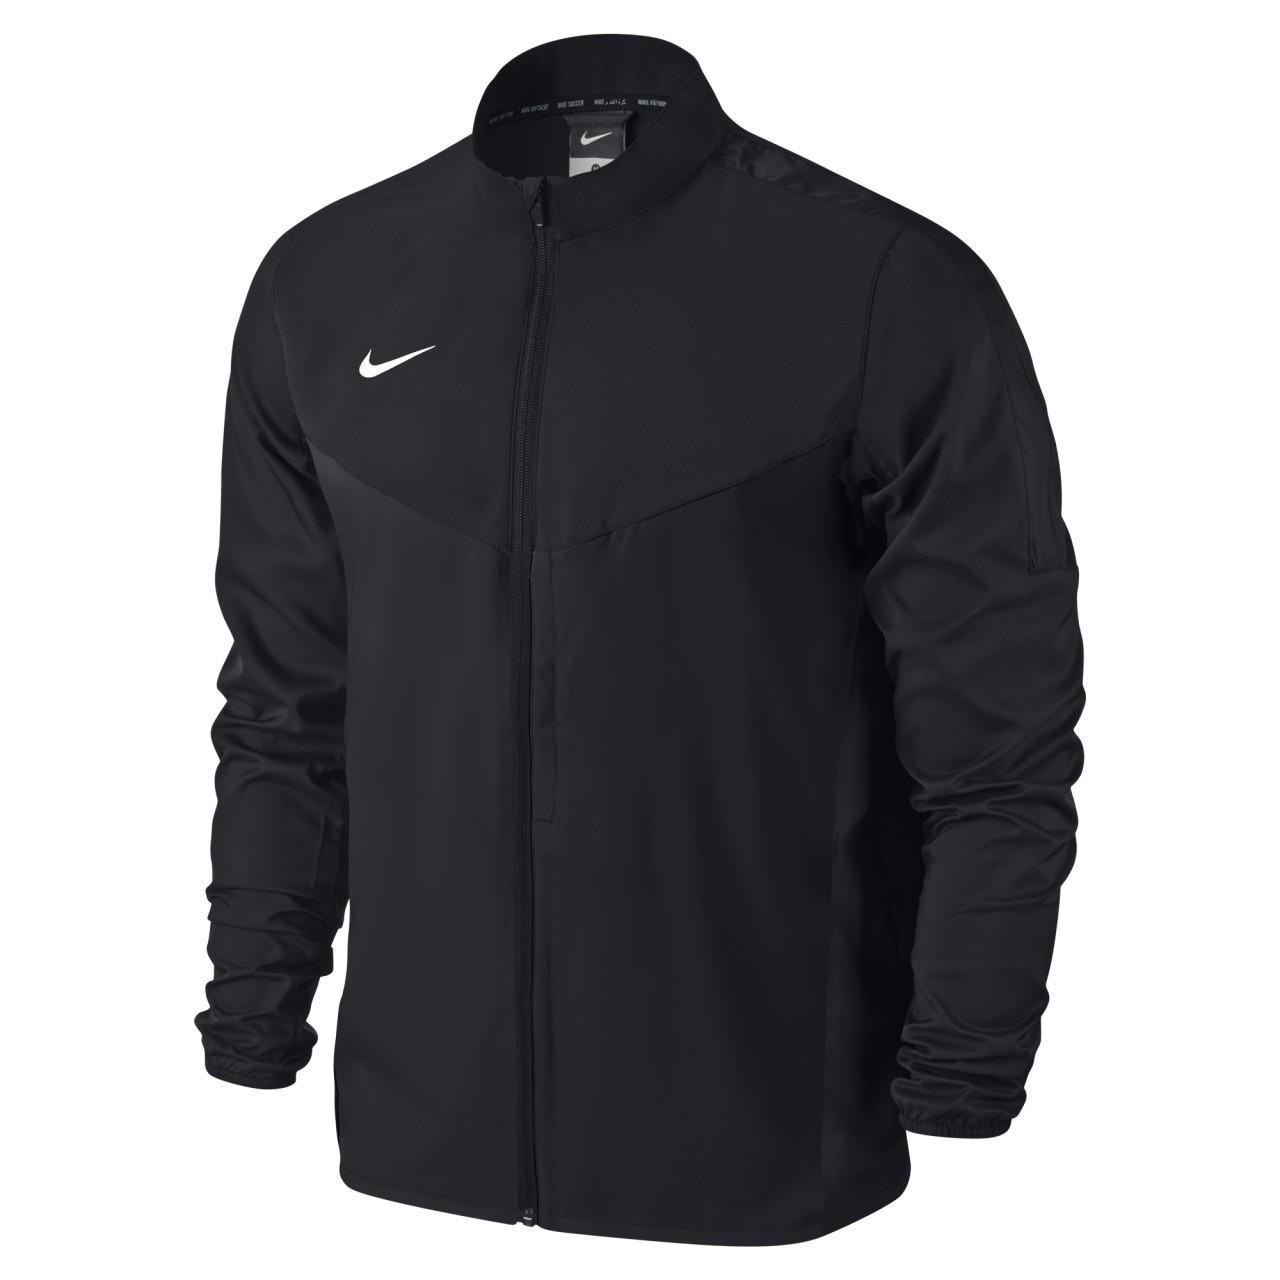 Nike Träningsjacka Team Performance Shield Svart Barn